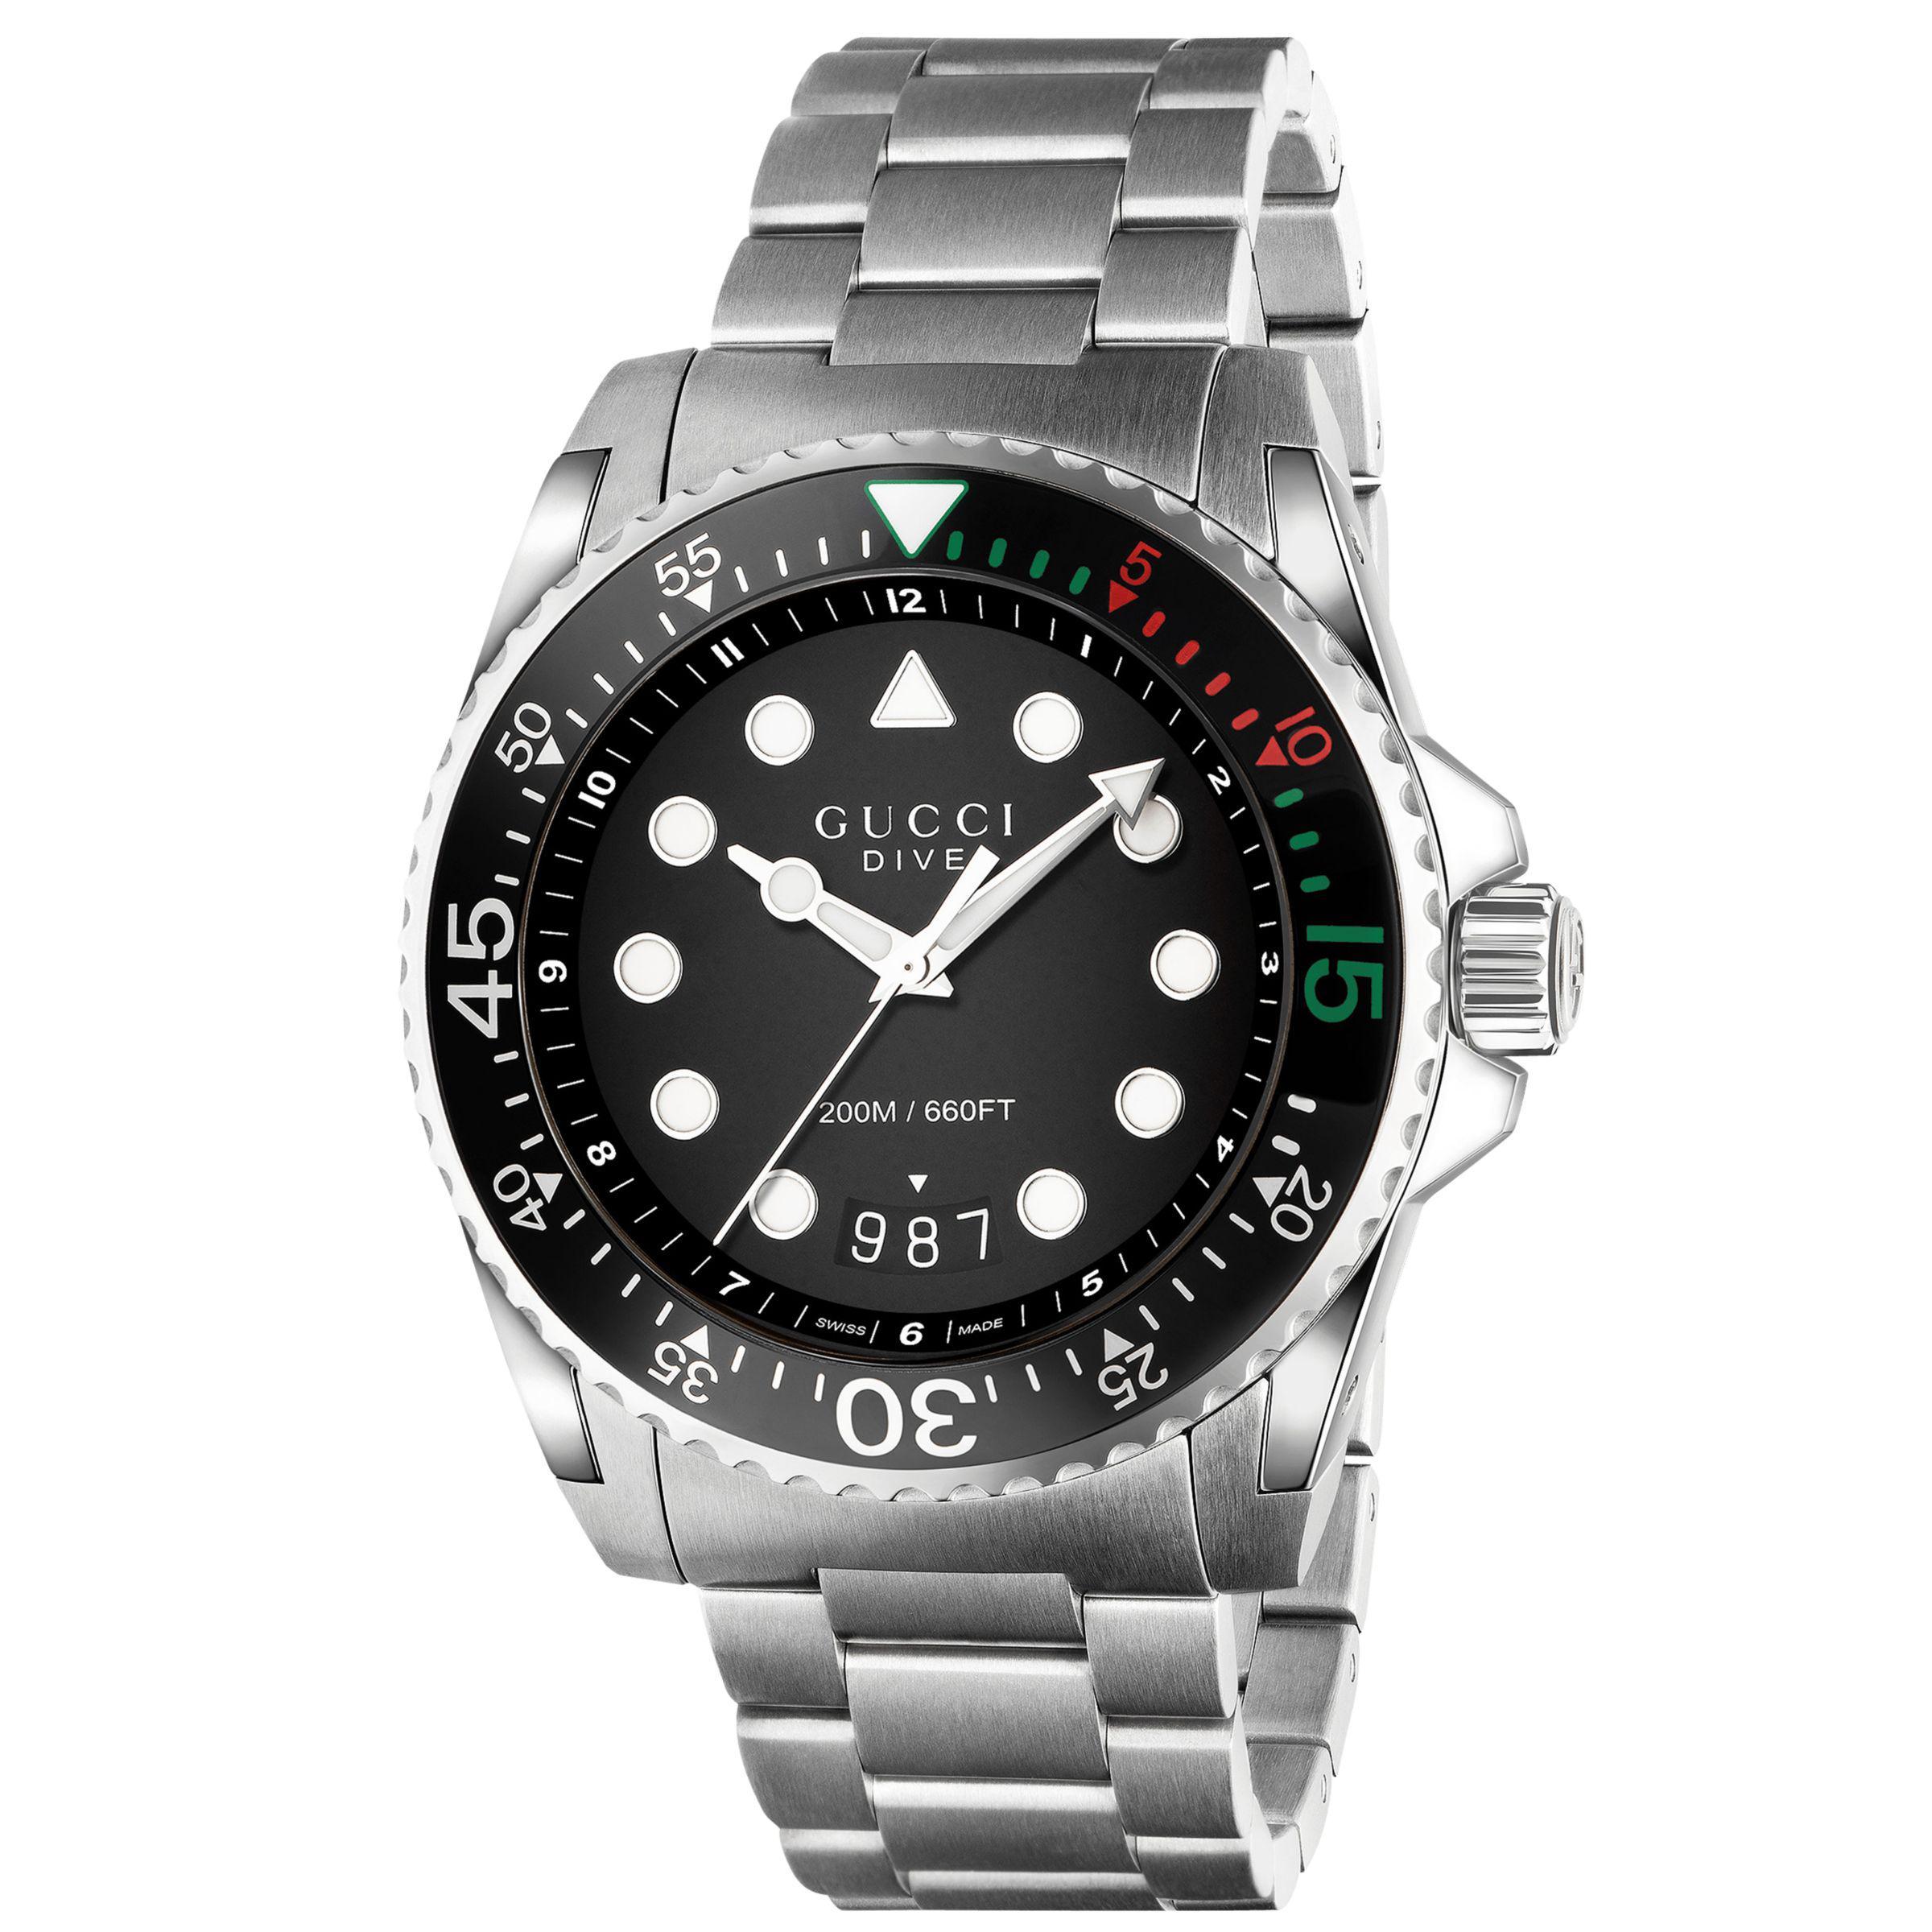 8d48306c390 Gucci Ya136208 Unisex Dive Stainless Steel Bracelet Strap Watch in ...